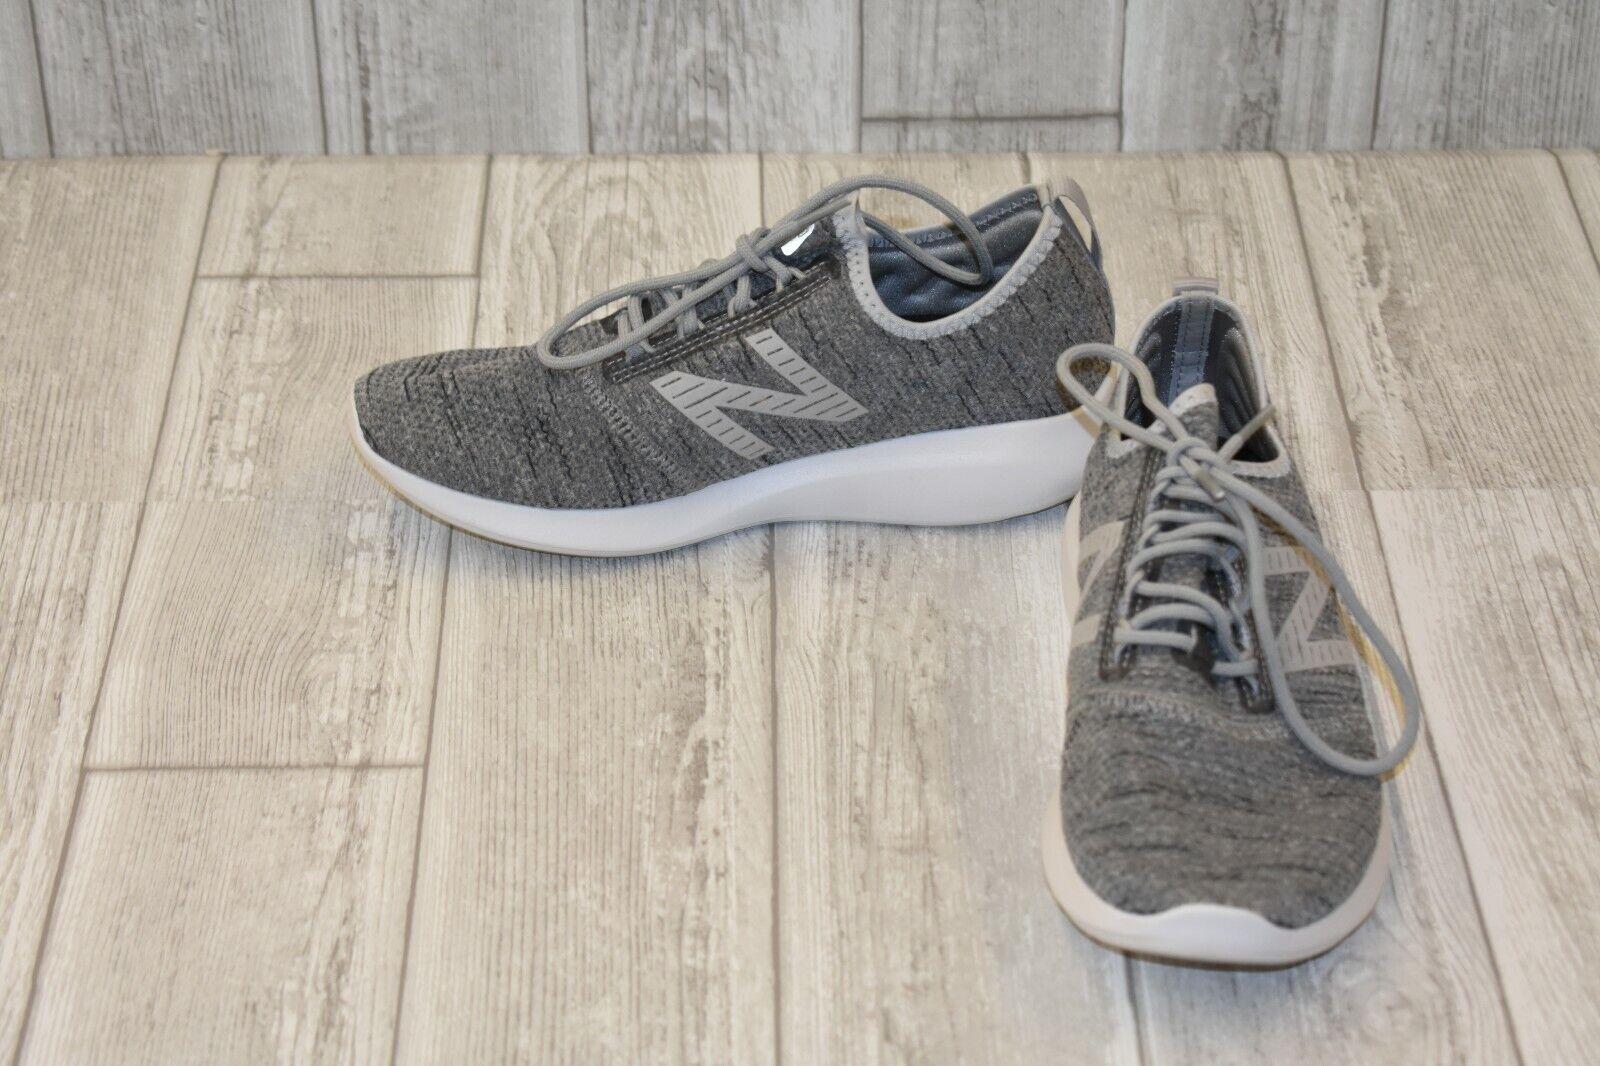 New Balance Coast v4 Running shoes - Women's Size 7.5D, Grey White